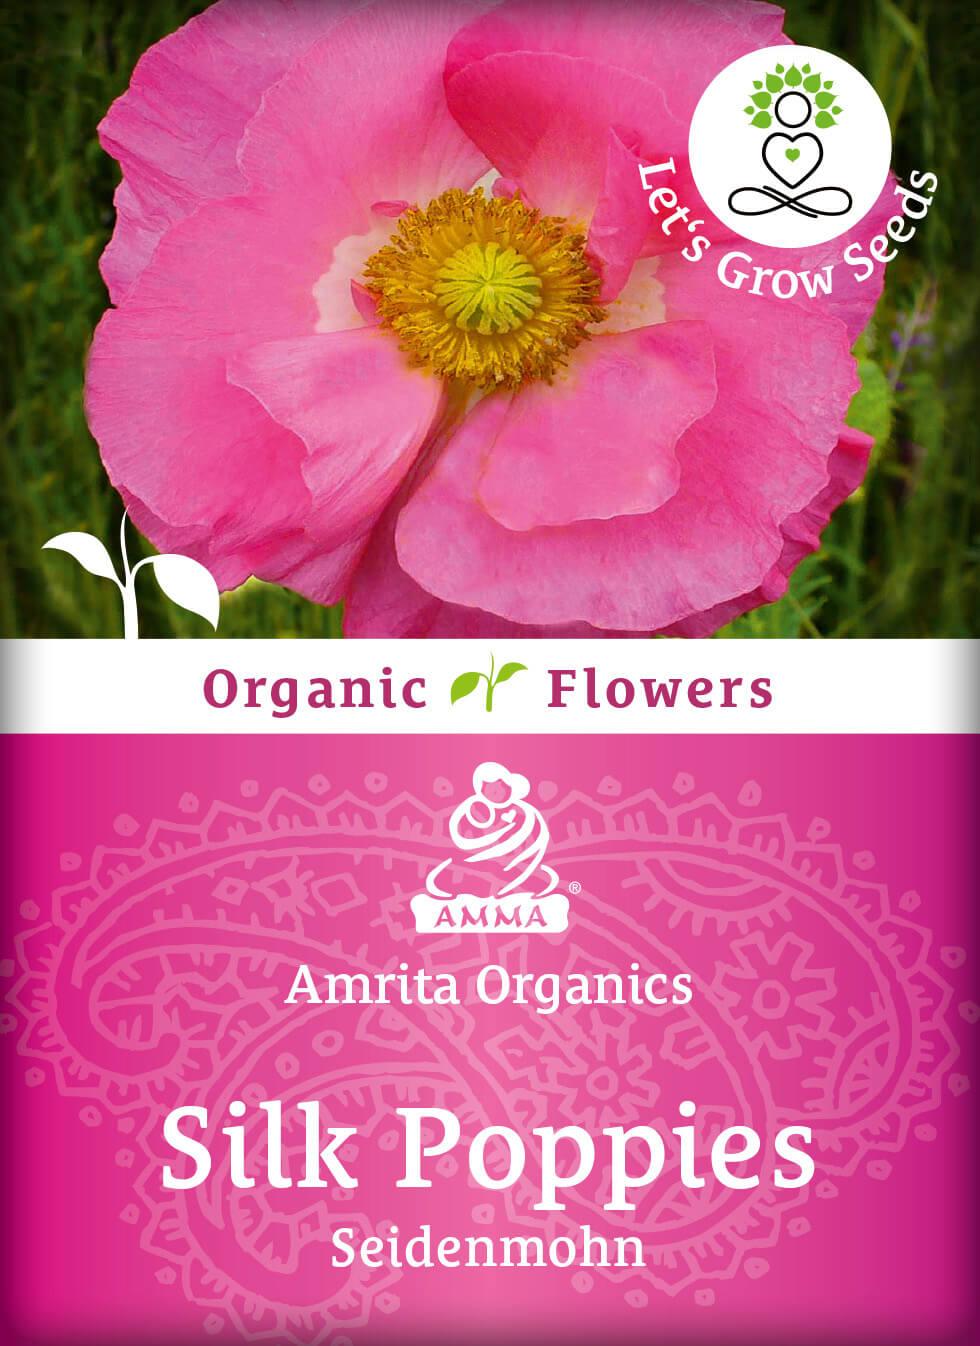 Silk Poppies, organic